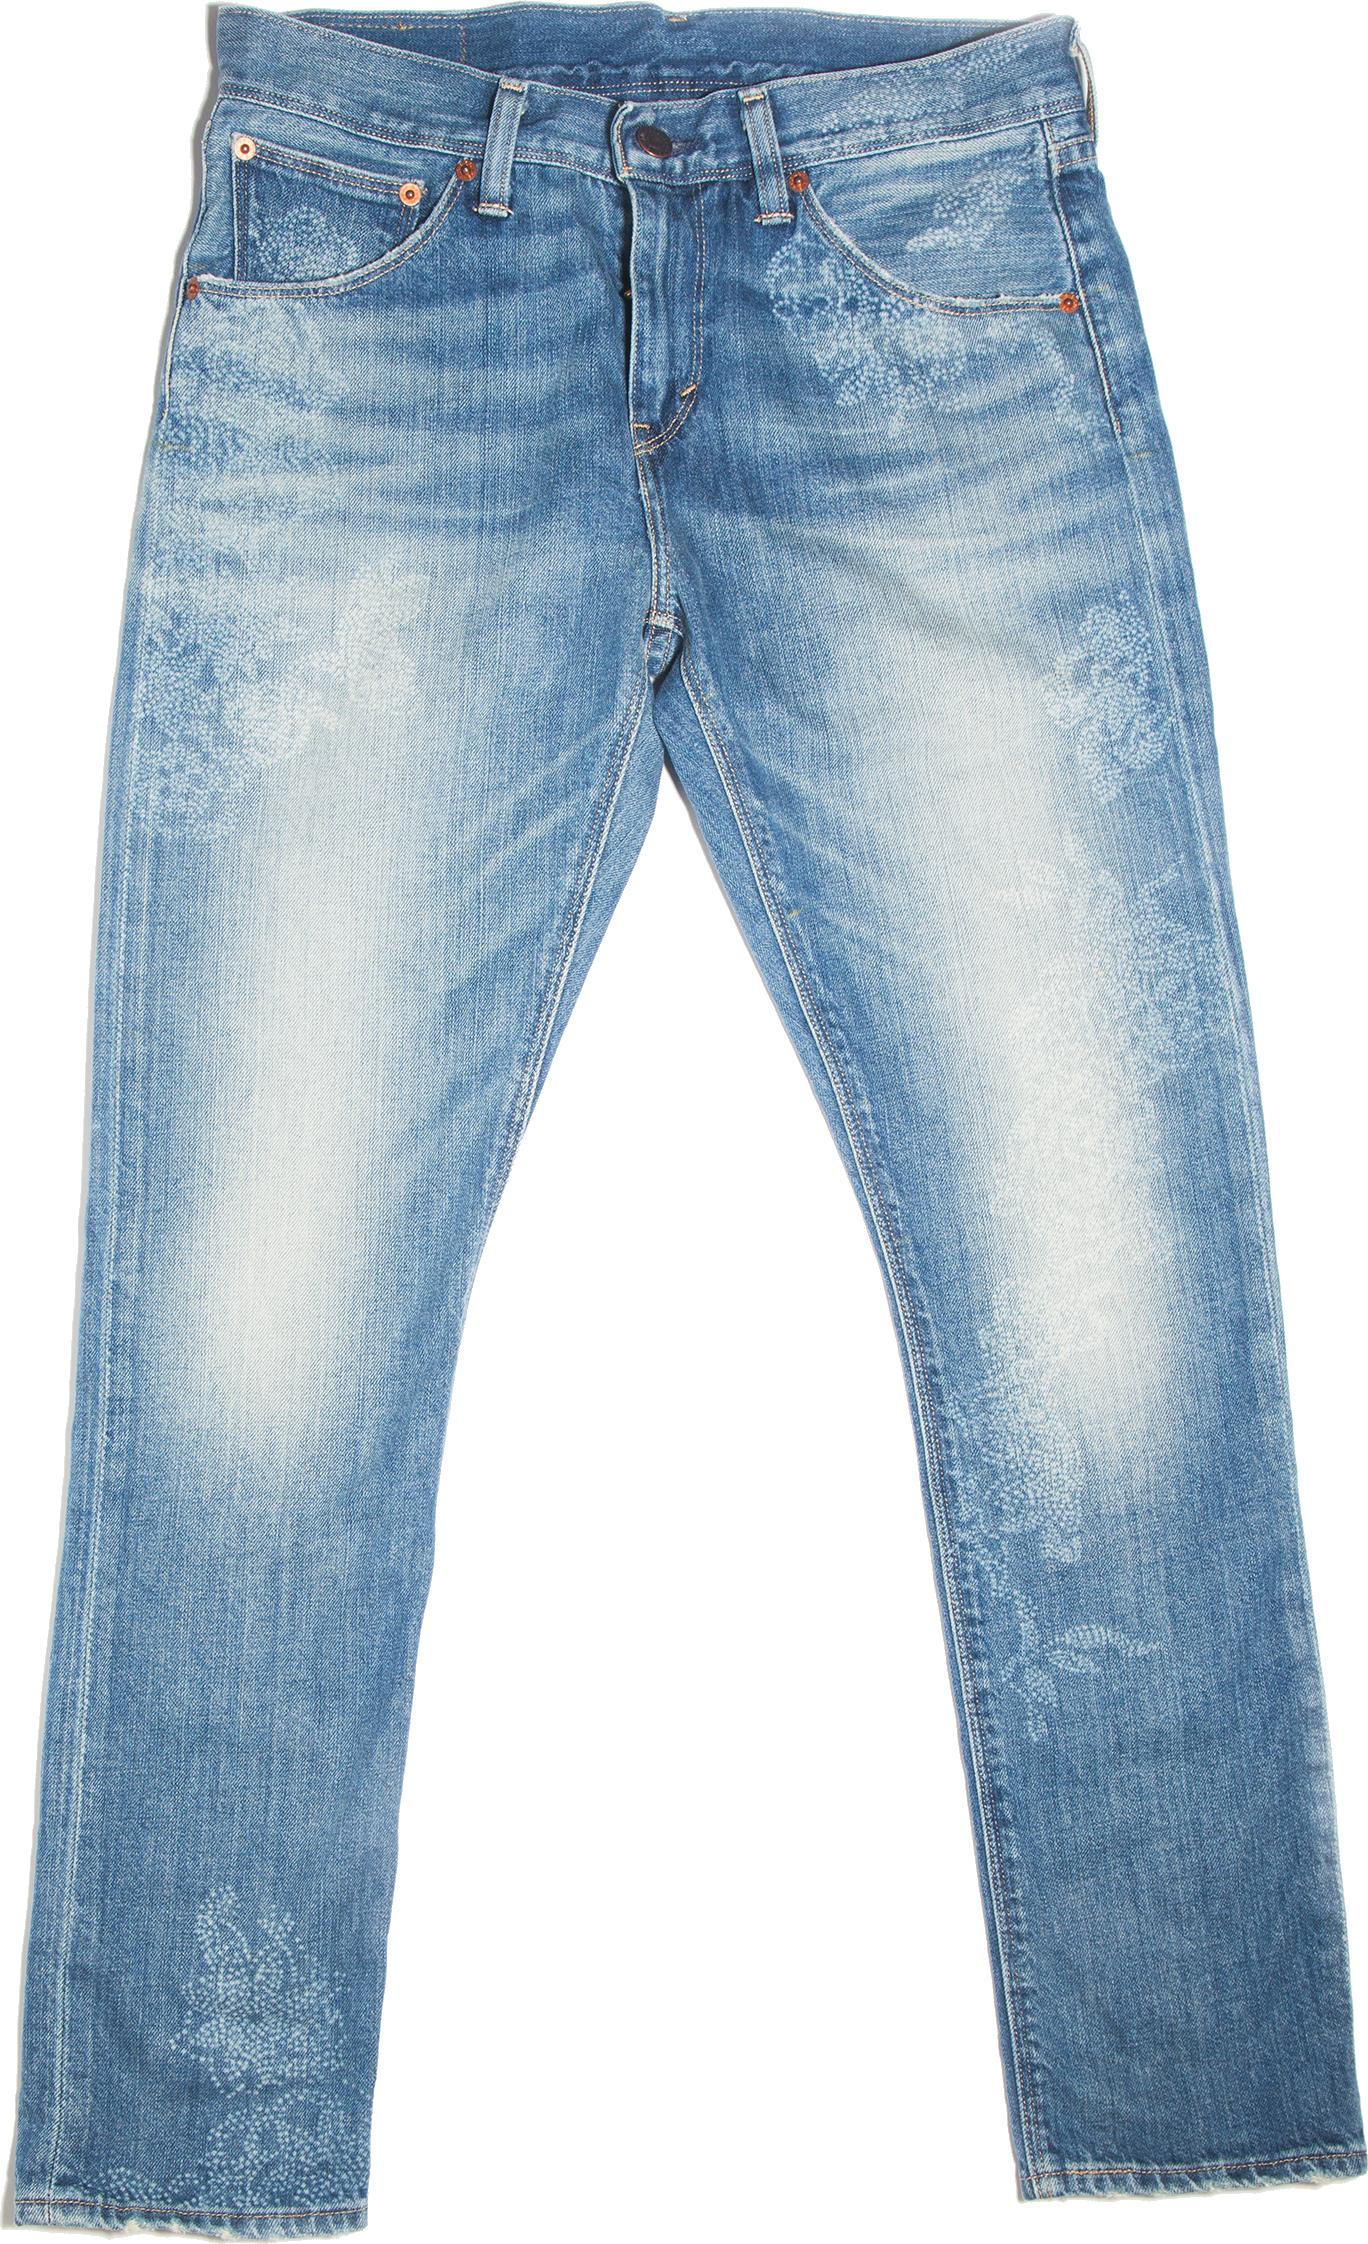 jeans huge freebie. Pants clipart line art